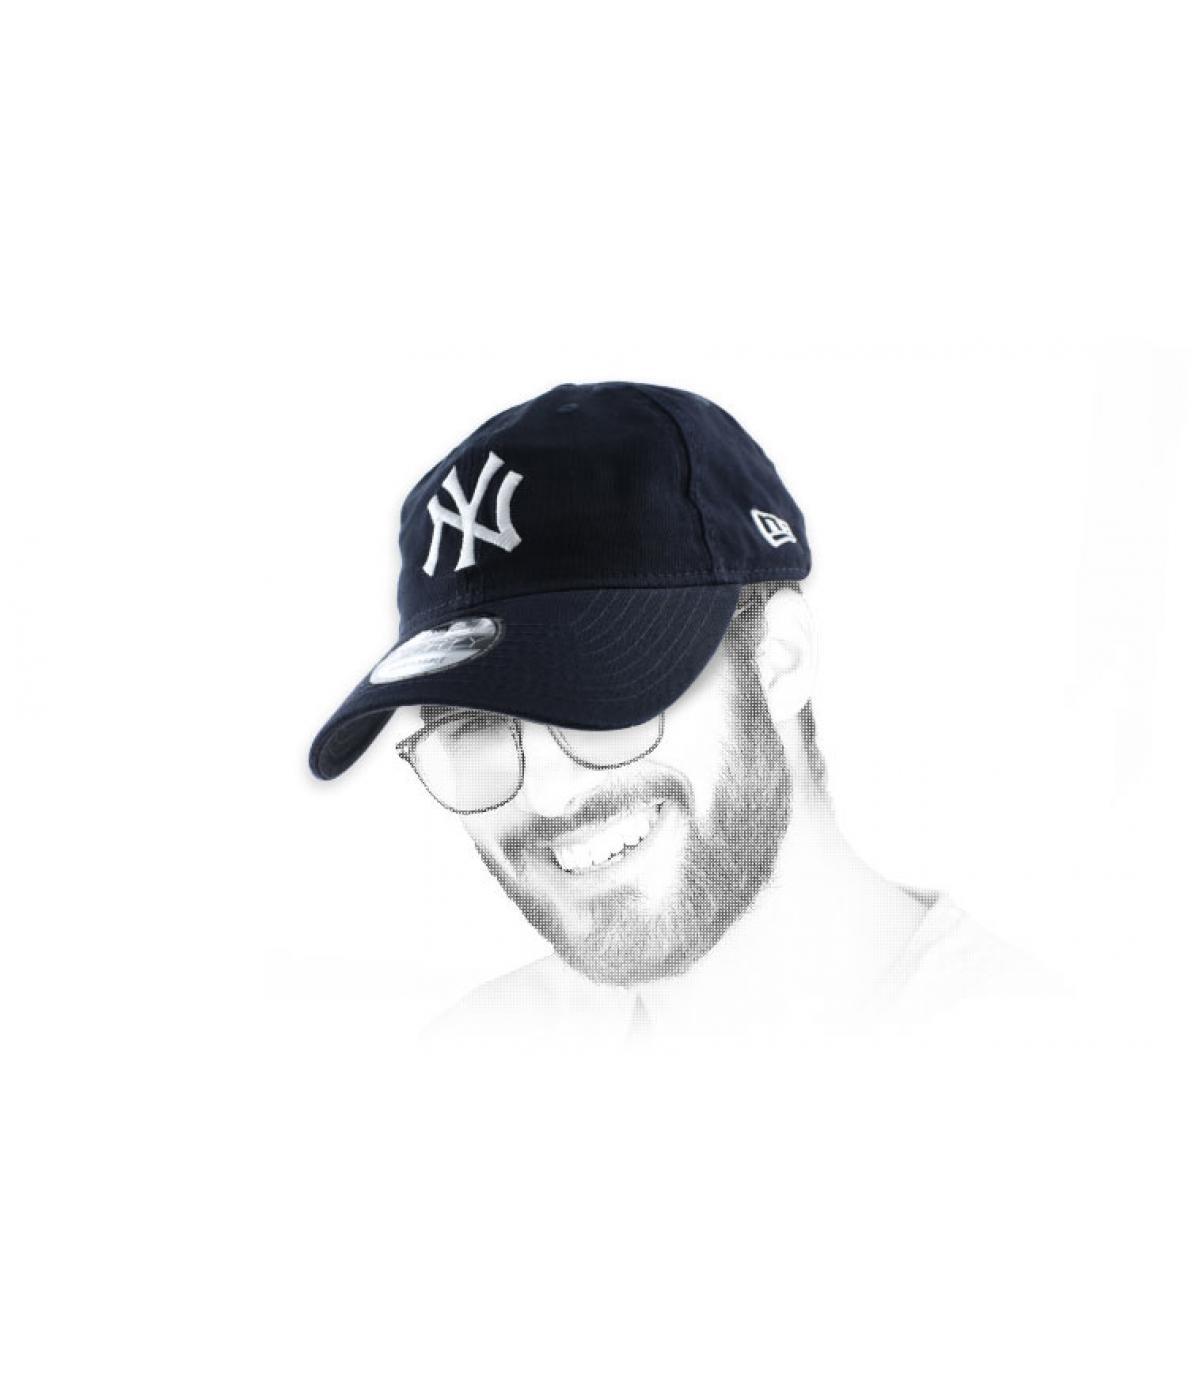 NY ongestructureerde cap blue